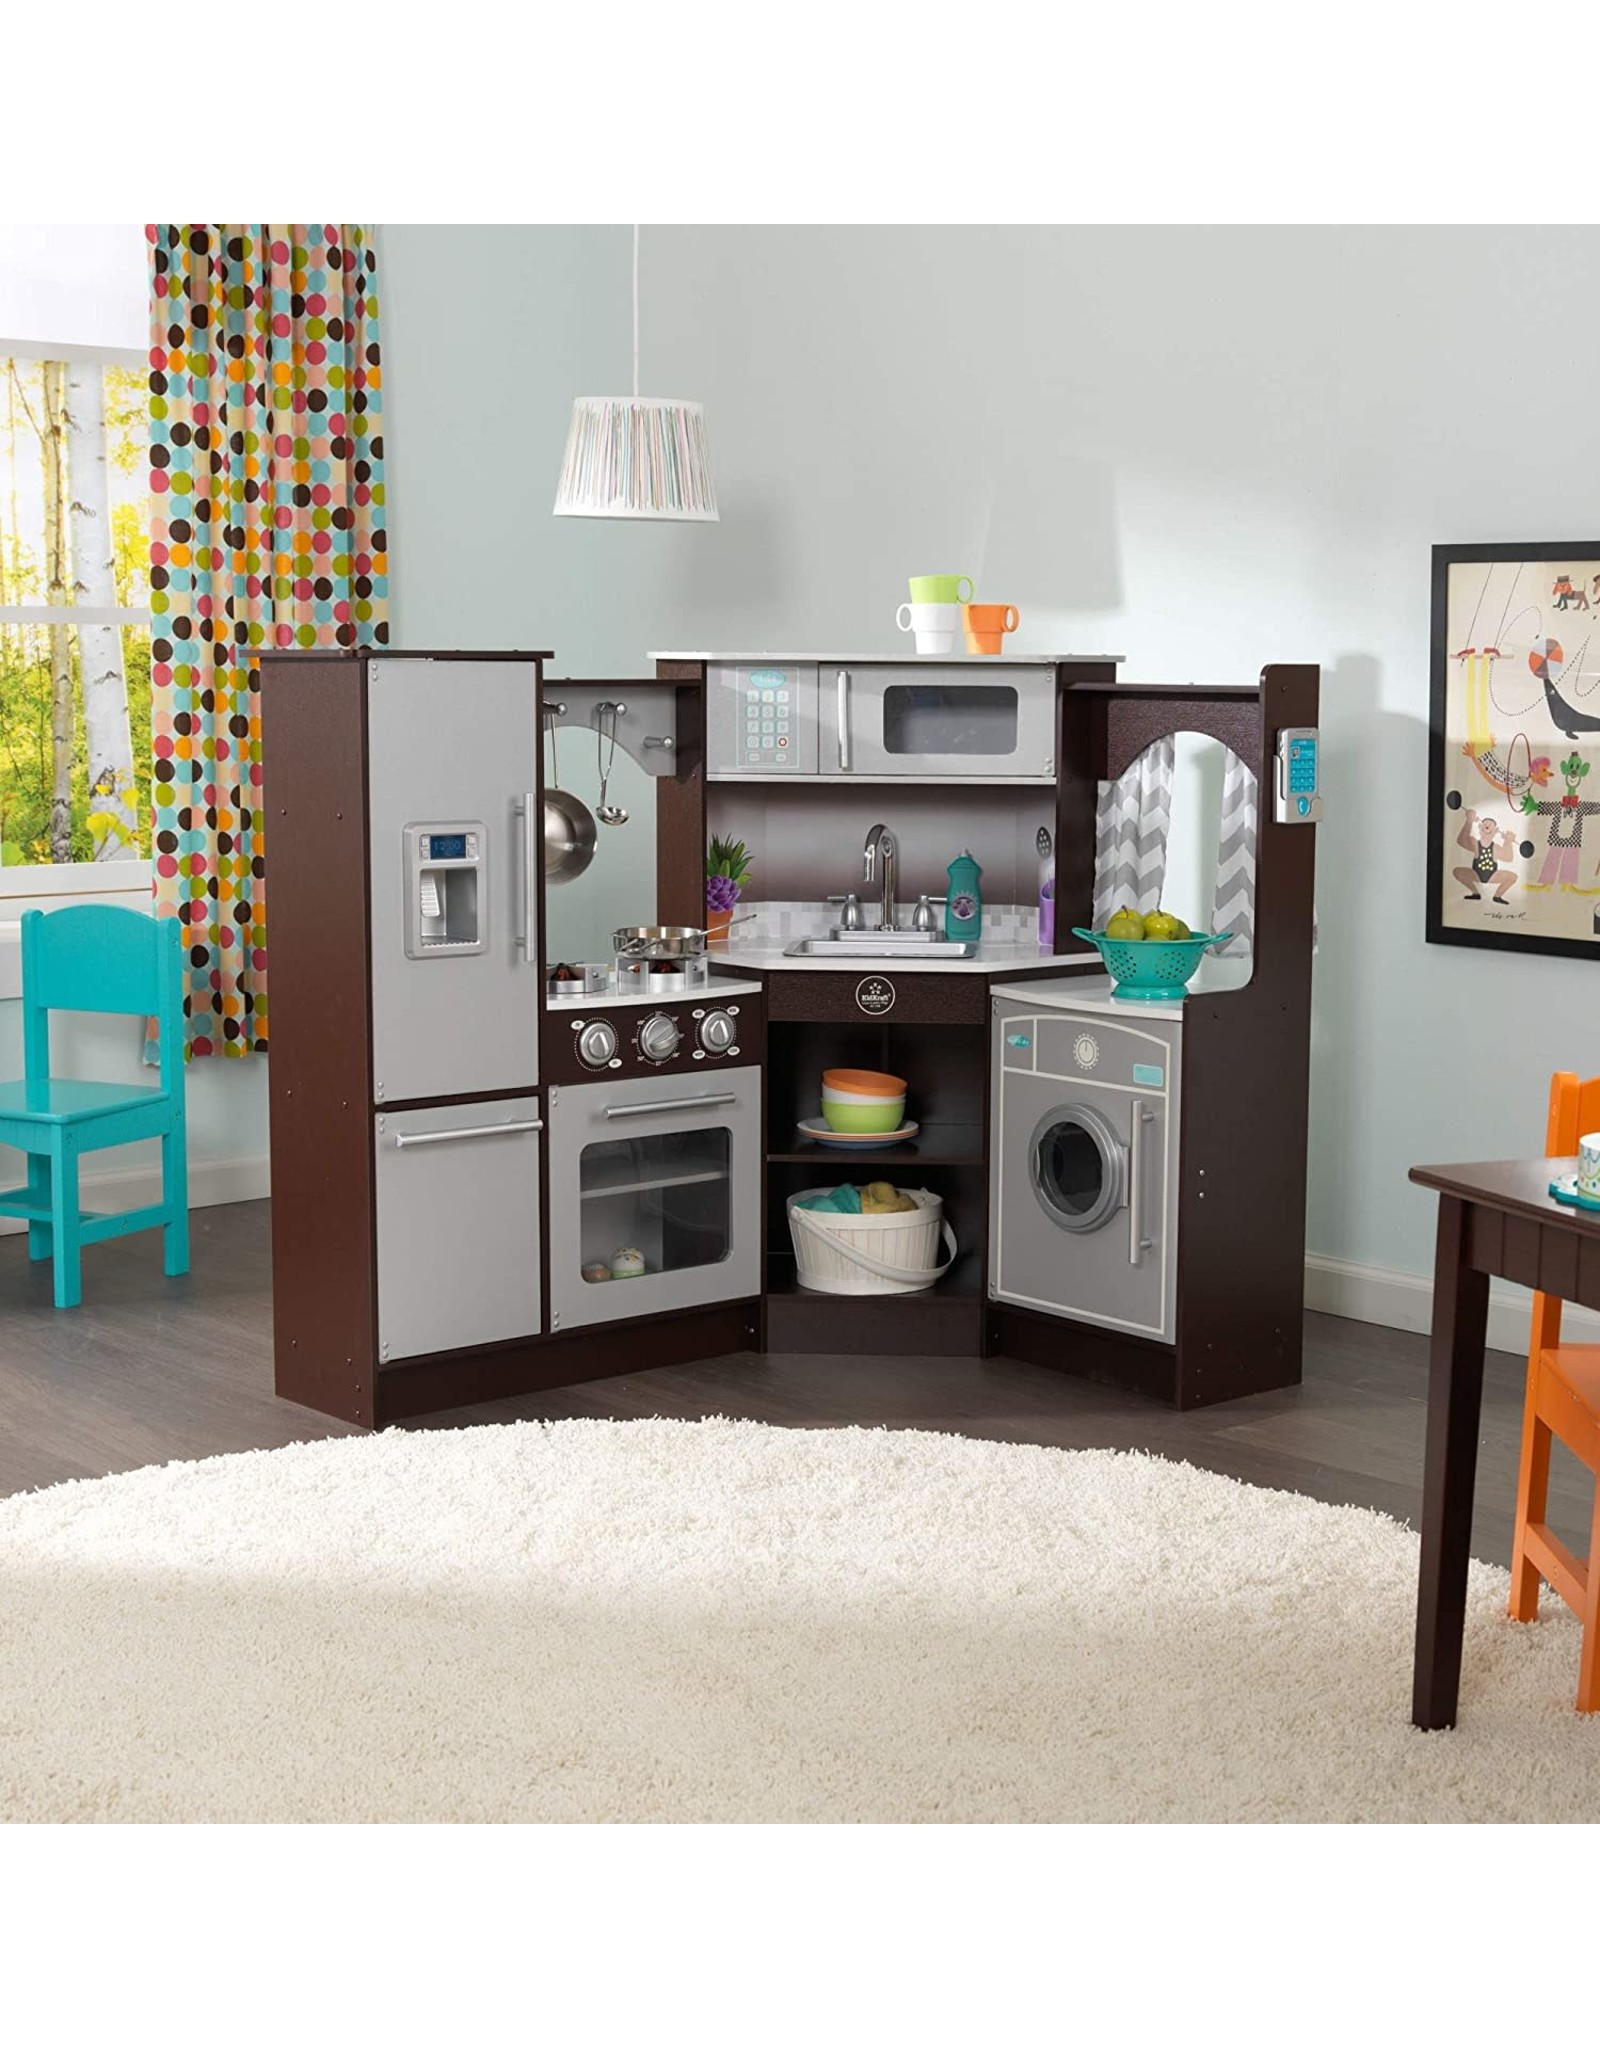 KidKraft KidKraft (53365) Ultimate Corner Play Kitchen with Lights & Sounds, Espresso